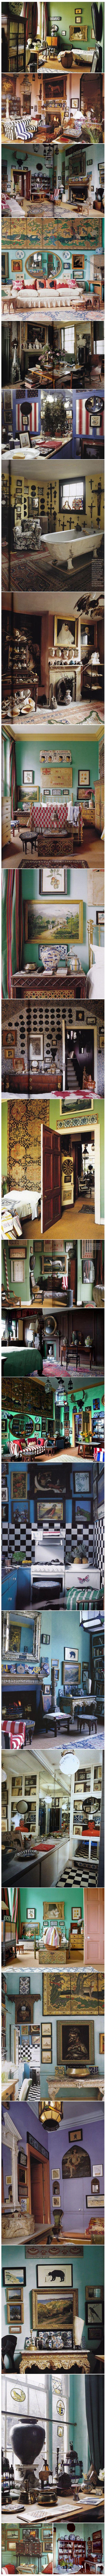 Peter Hinwood's London apartment.